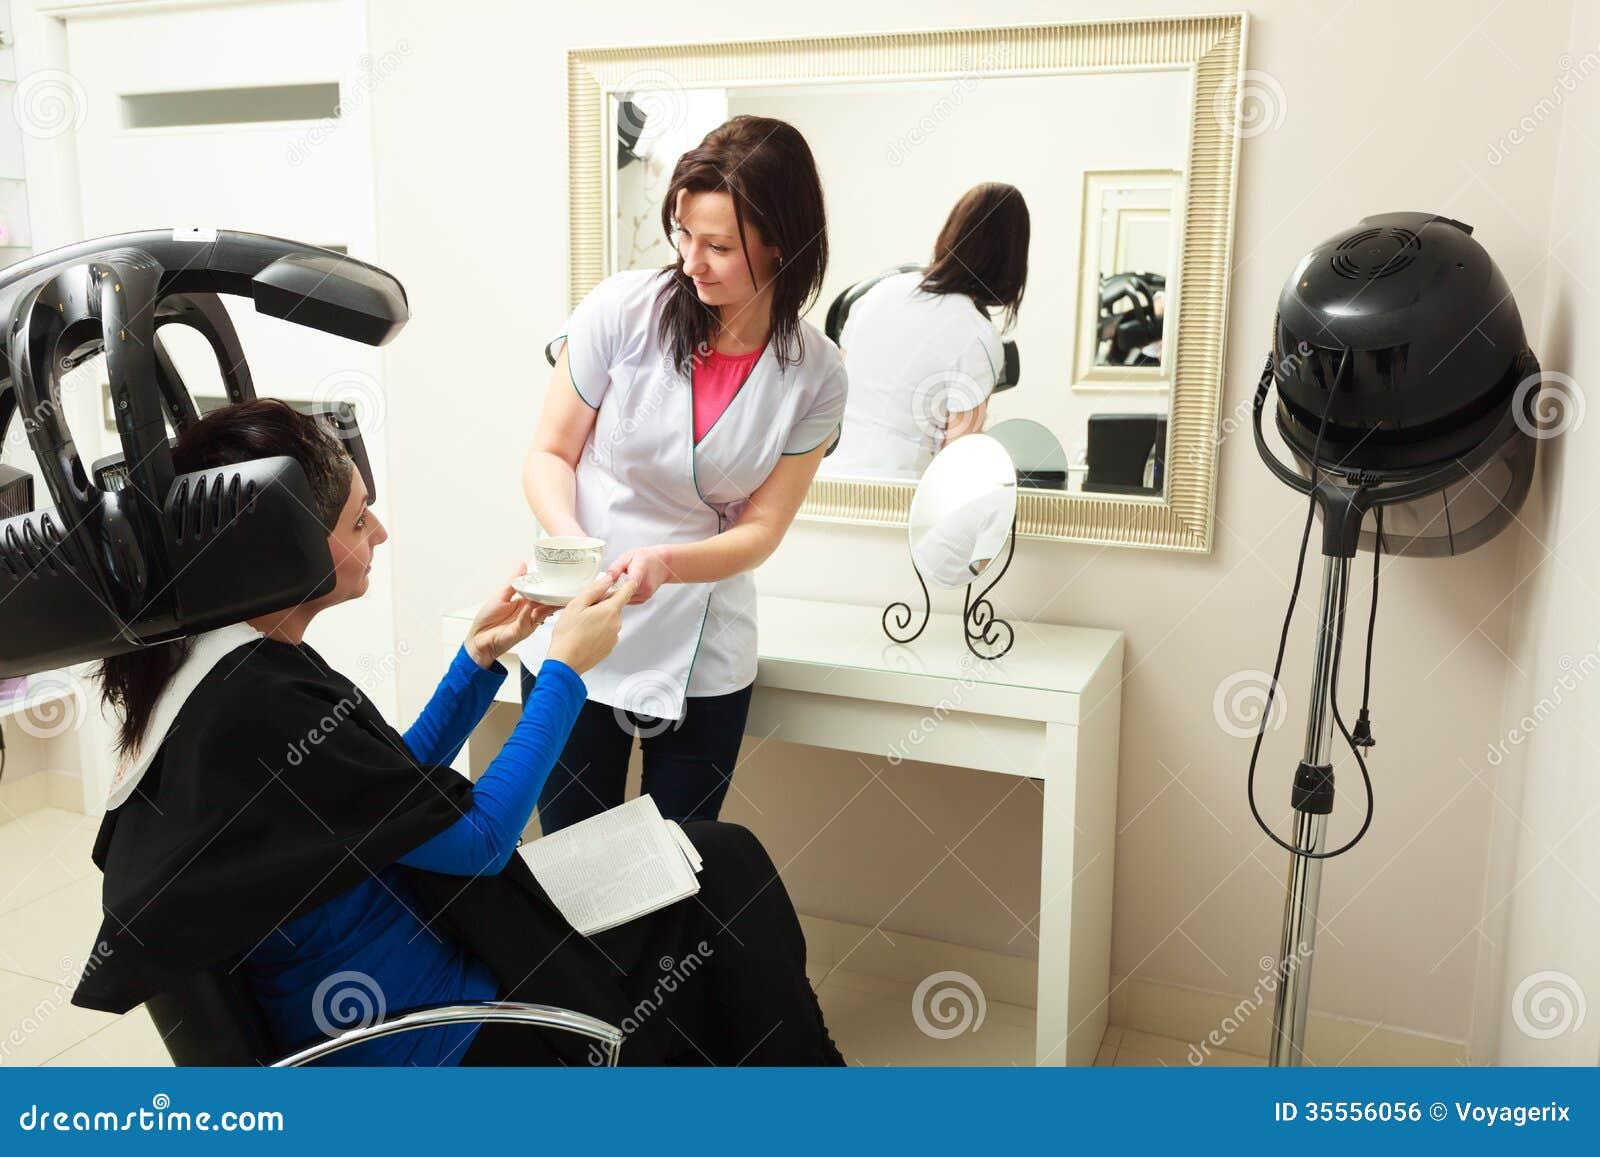 ... female client. Young women relaxing in hair salon. Modern equipment